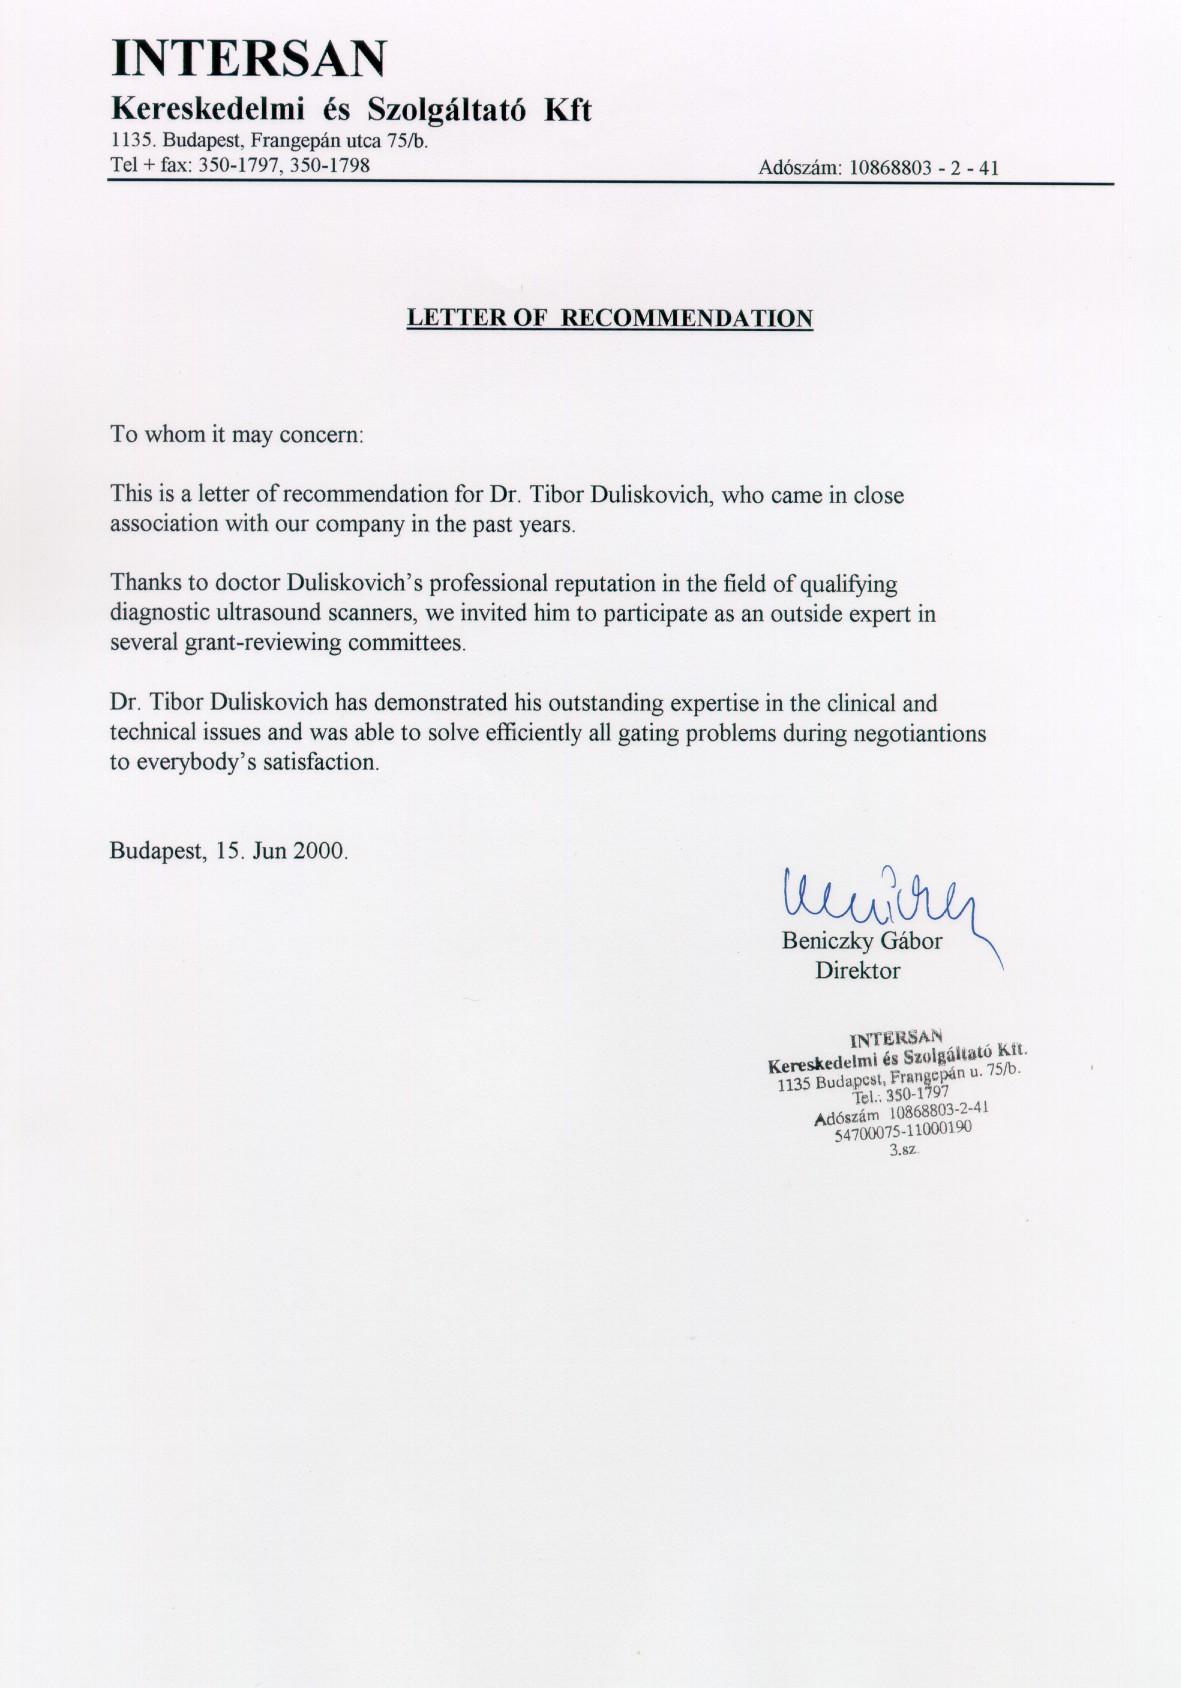 Sample reference letter for work colleague lvelegant re mendation letter for a doctor colleague spiritdancerdesigns Images